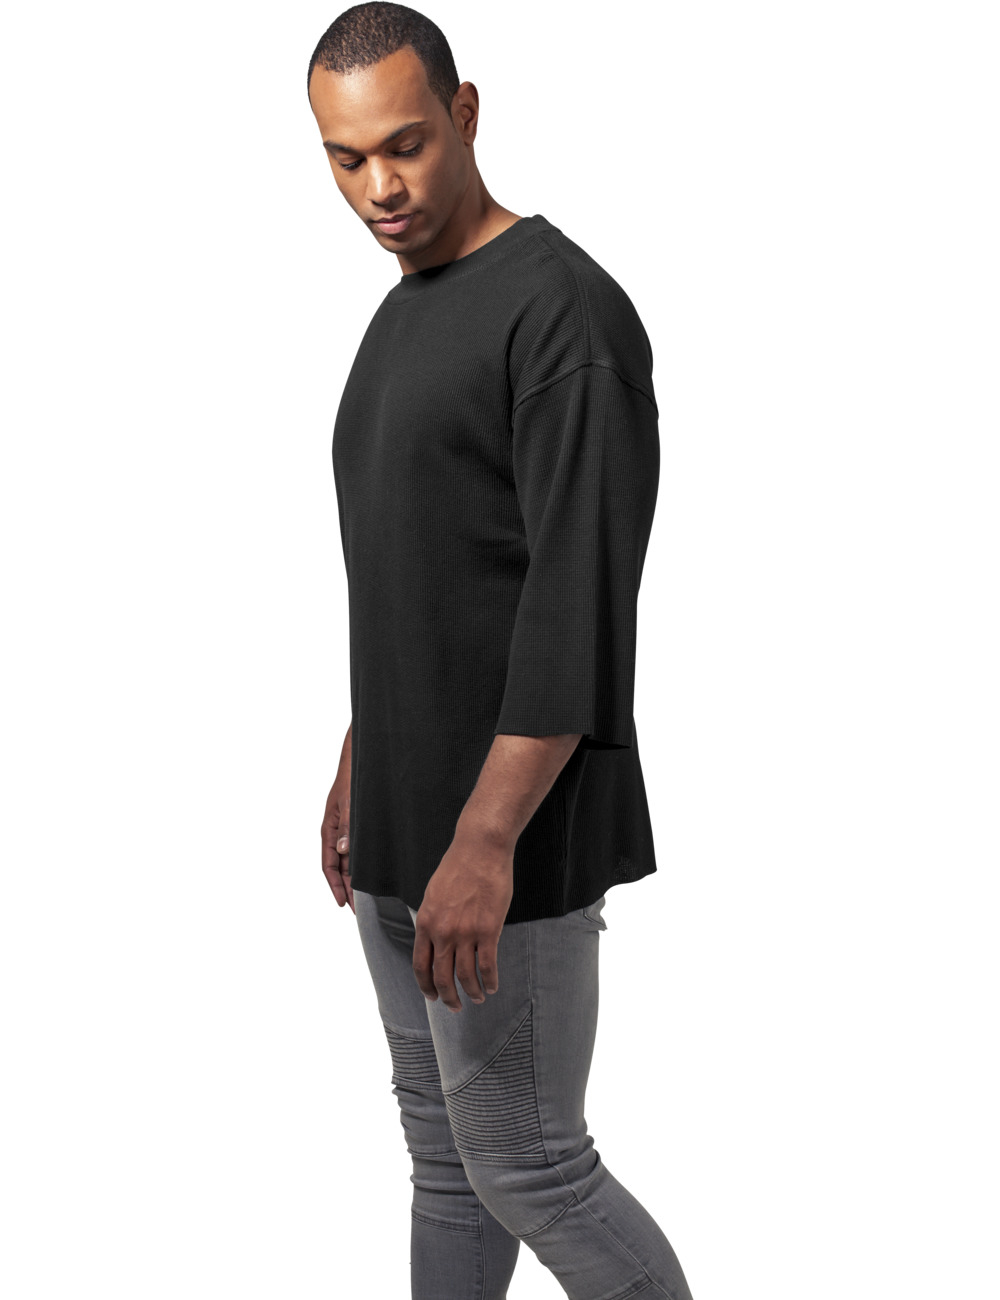 Urban Classics Herren Thermal Boxy Tee XL, Black (007)